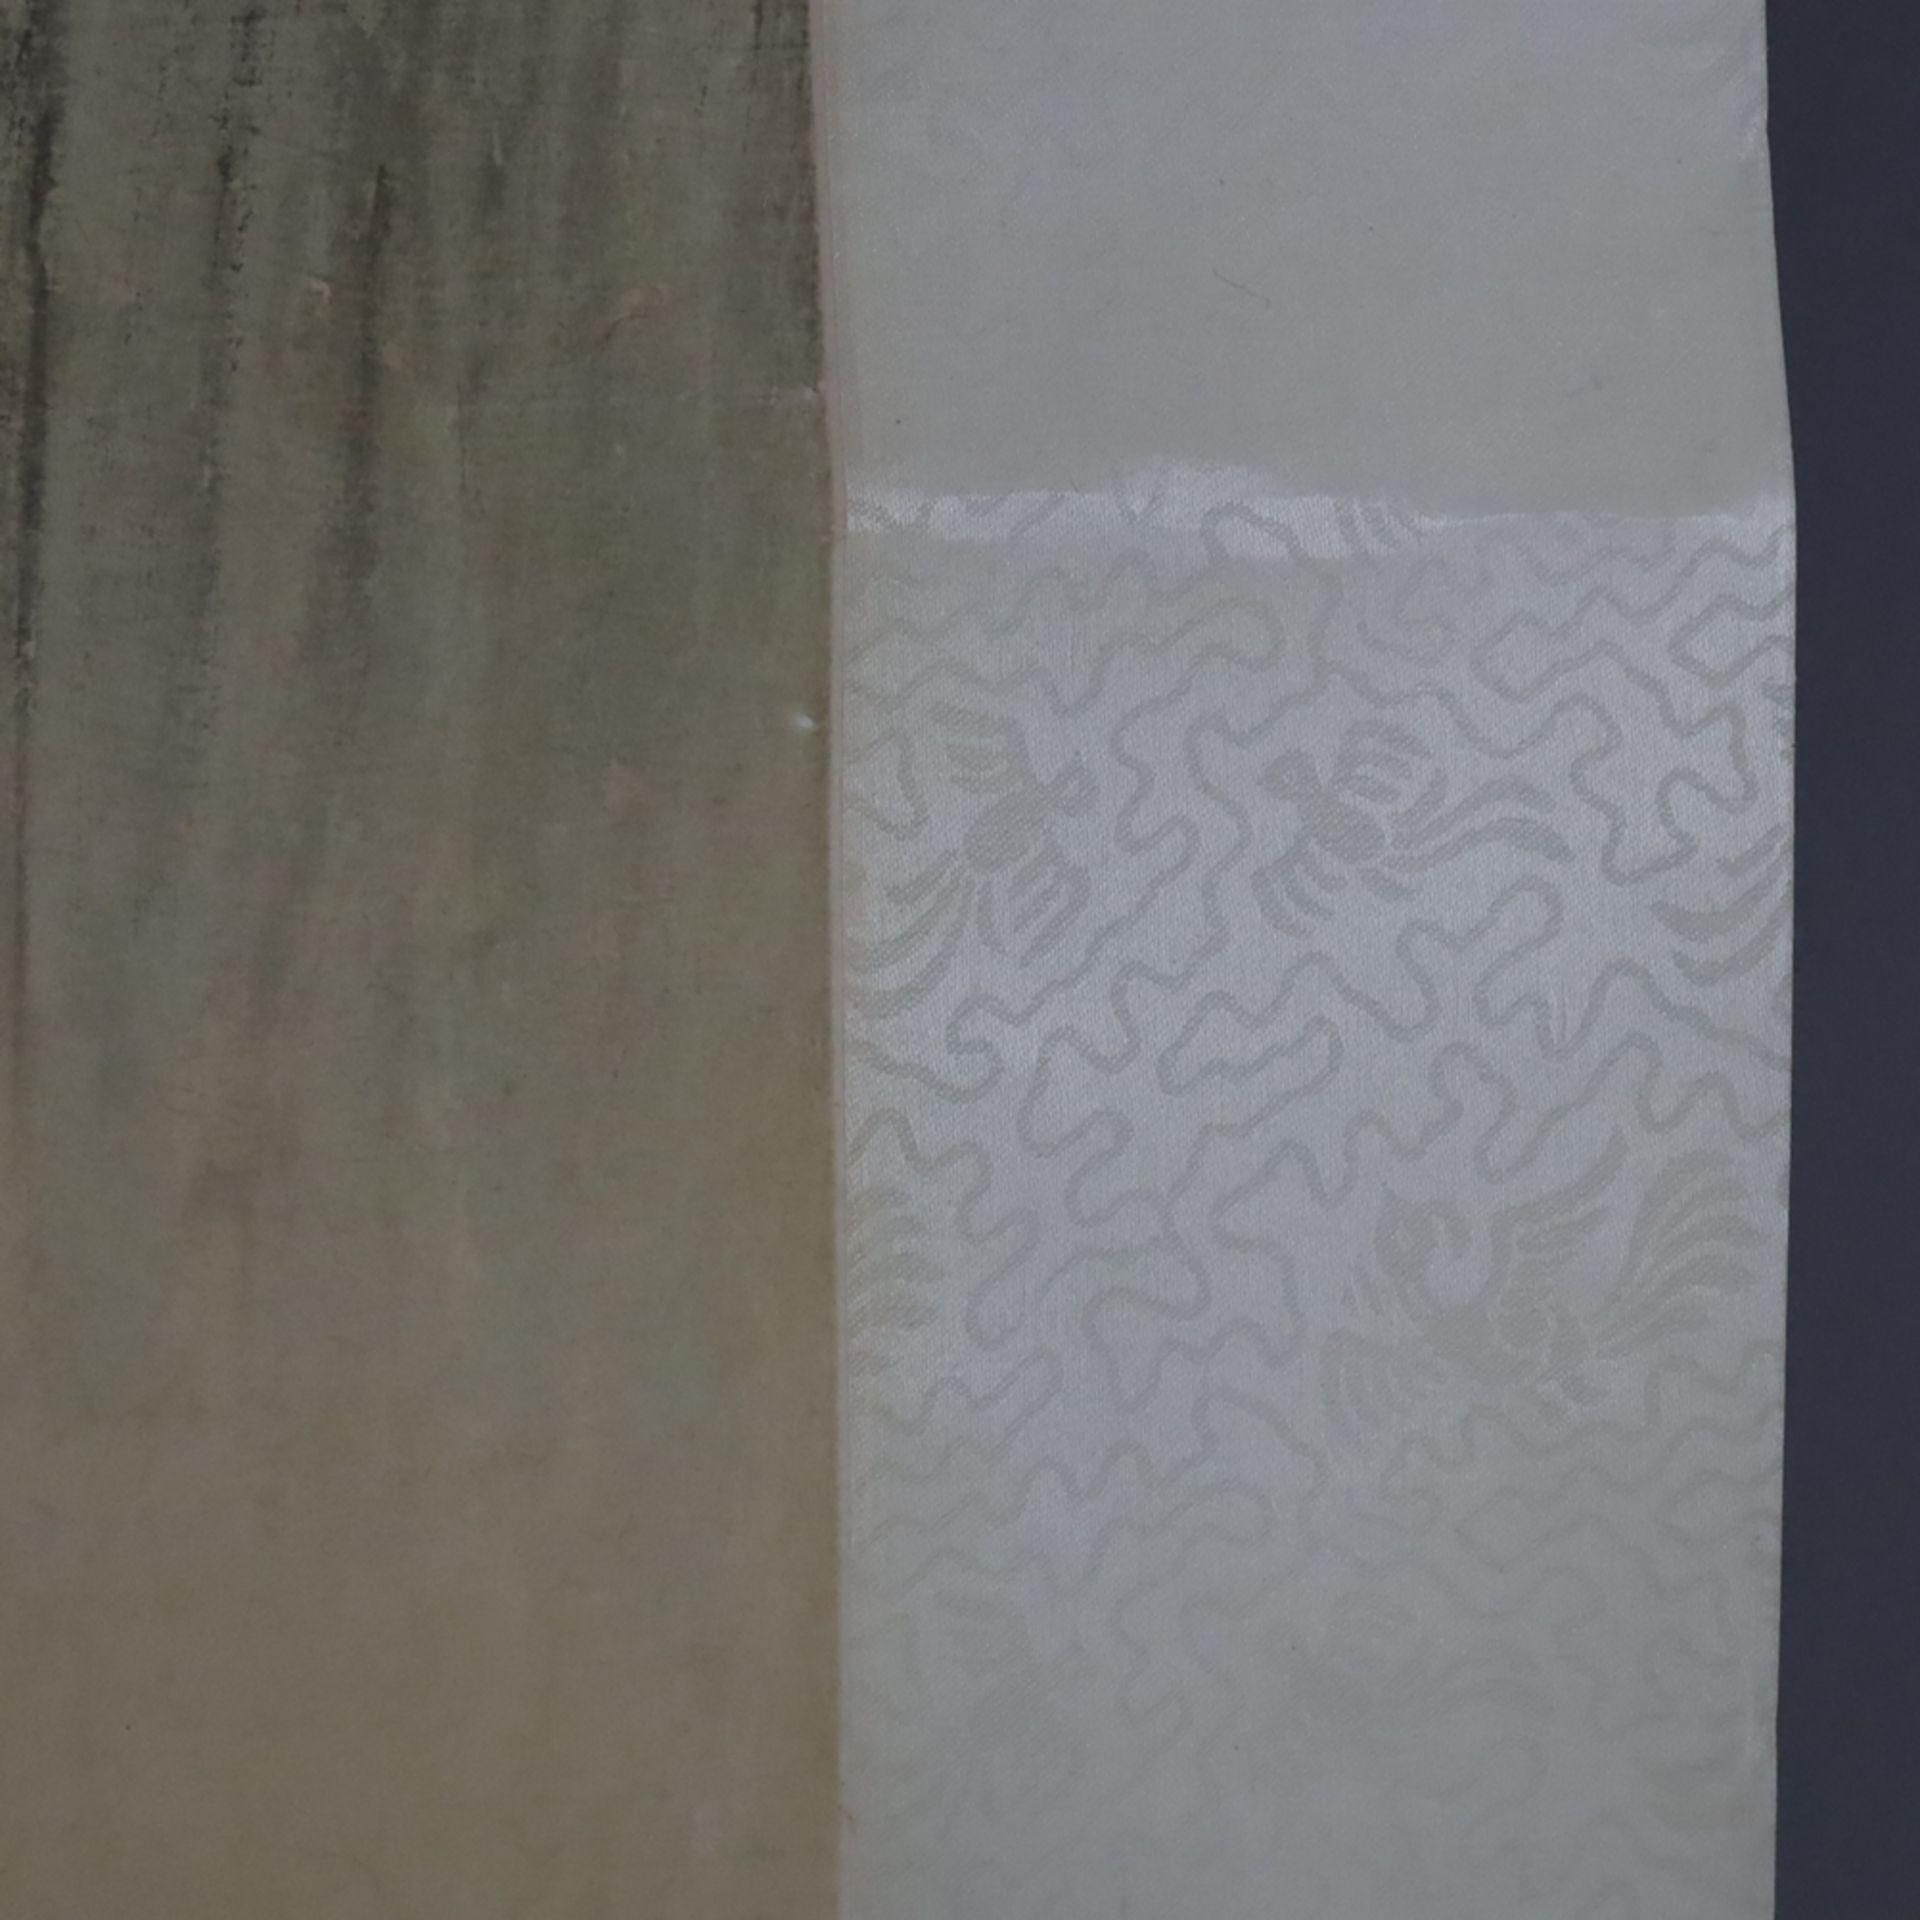 Chinesisches Rollbild - gesiegelt Zhang Daqian (   Chinese Hanging Scroll - sealed Zhang Daqian (18 - Image 17 of 18